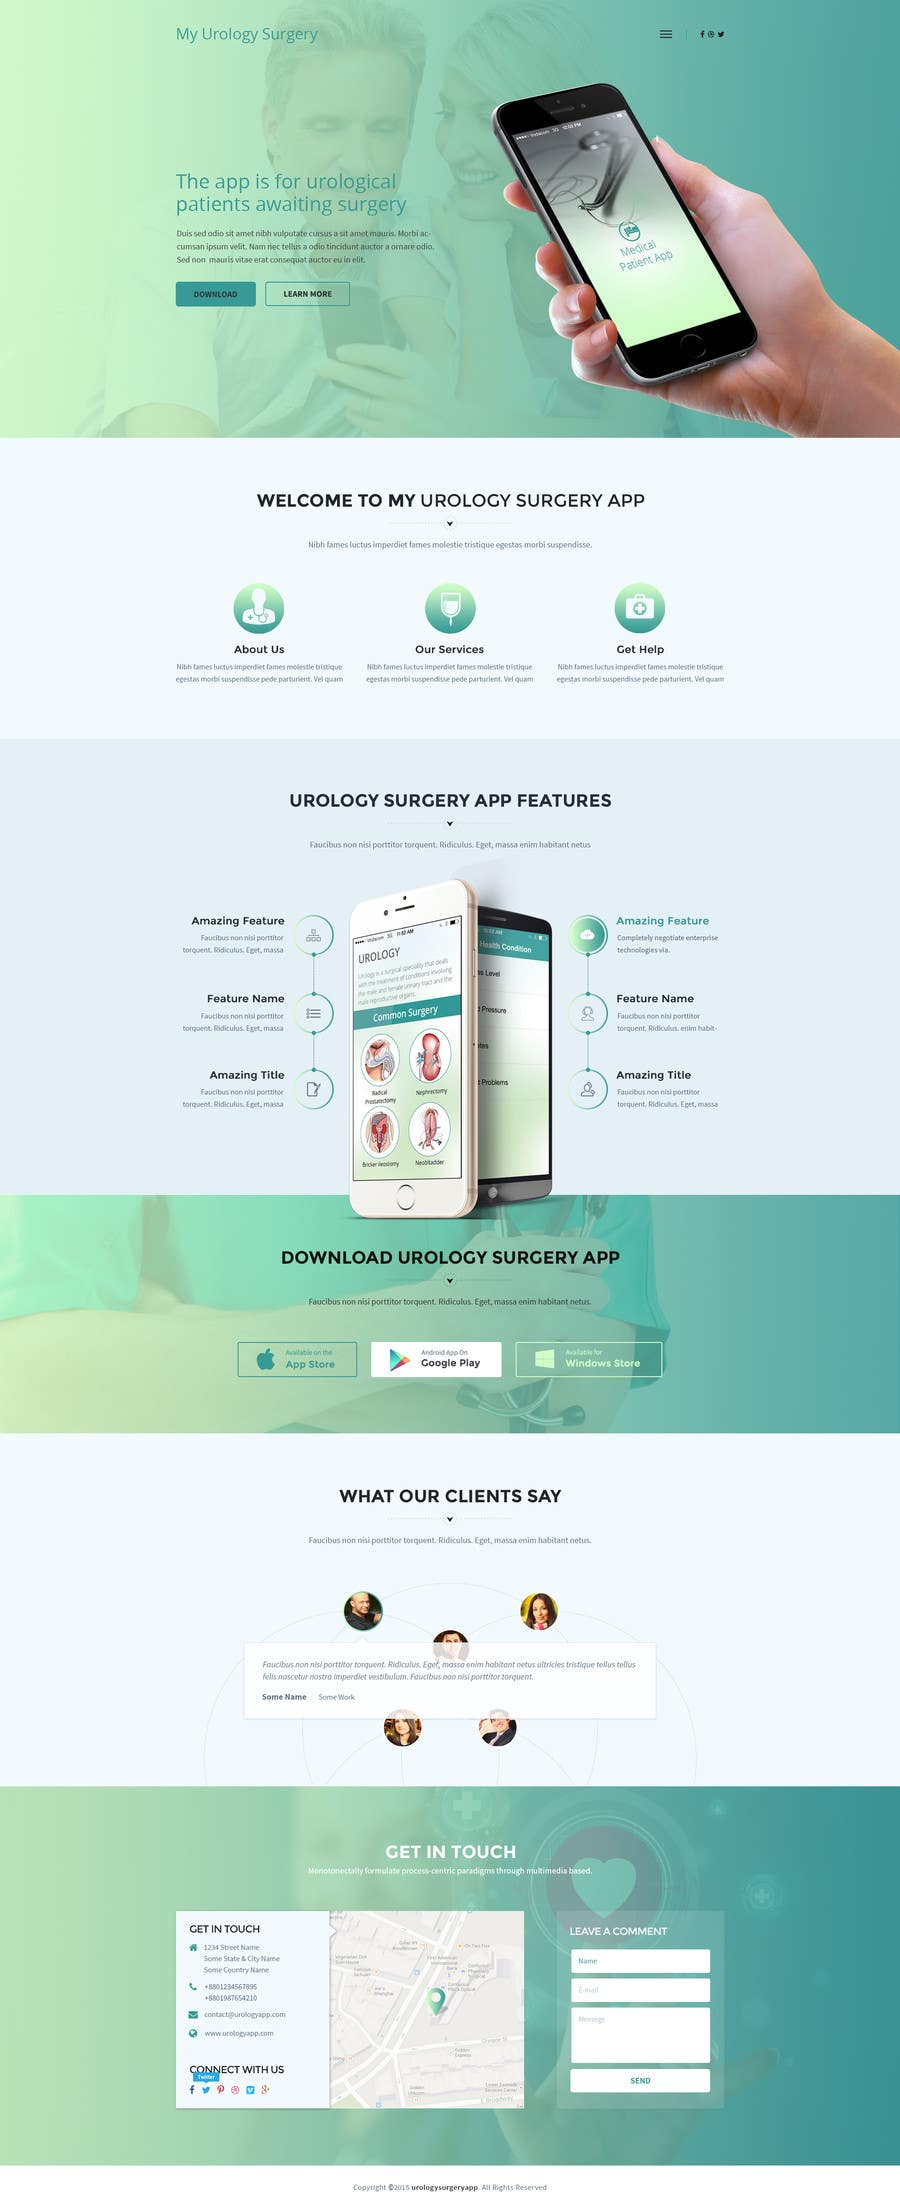 Penyertaan Peraduan #4 untuk Design a Website Mockup homepage for a medical app